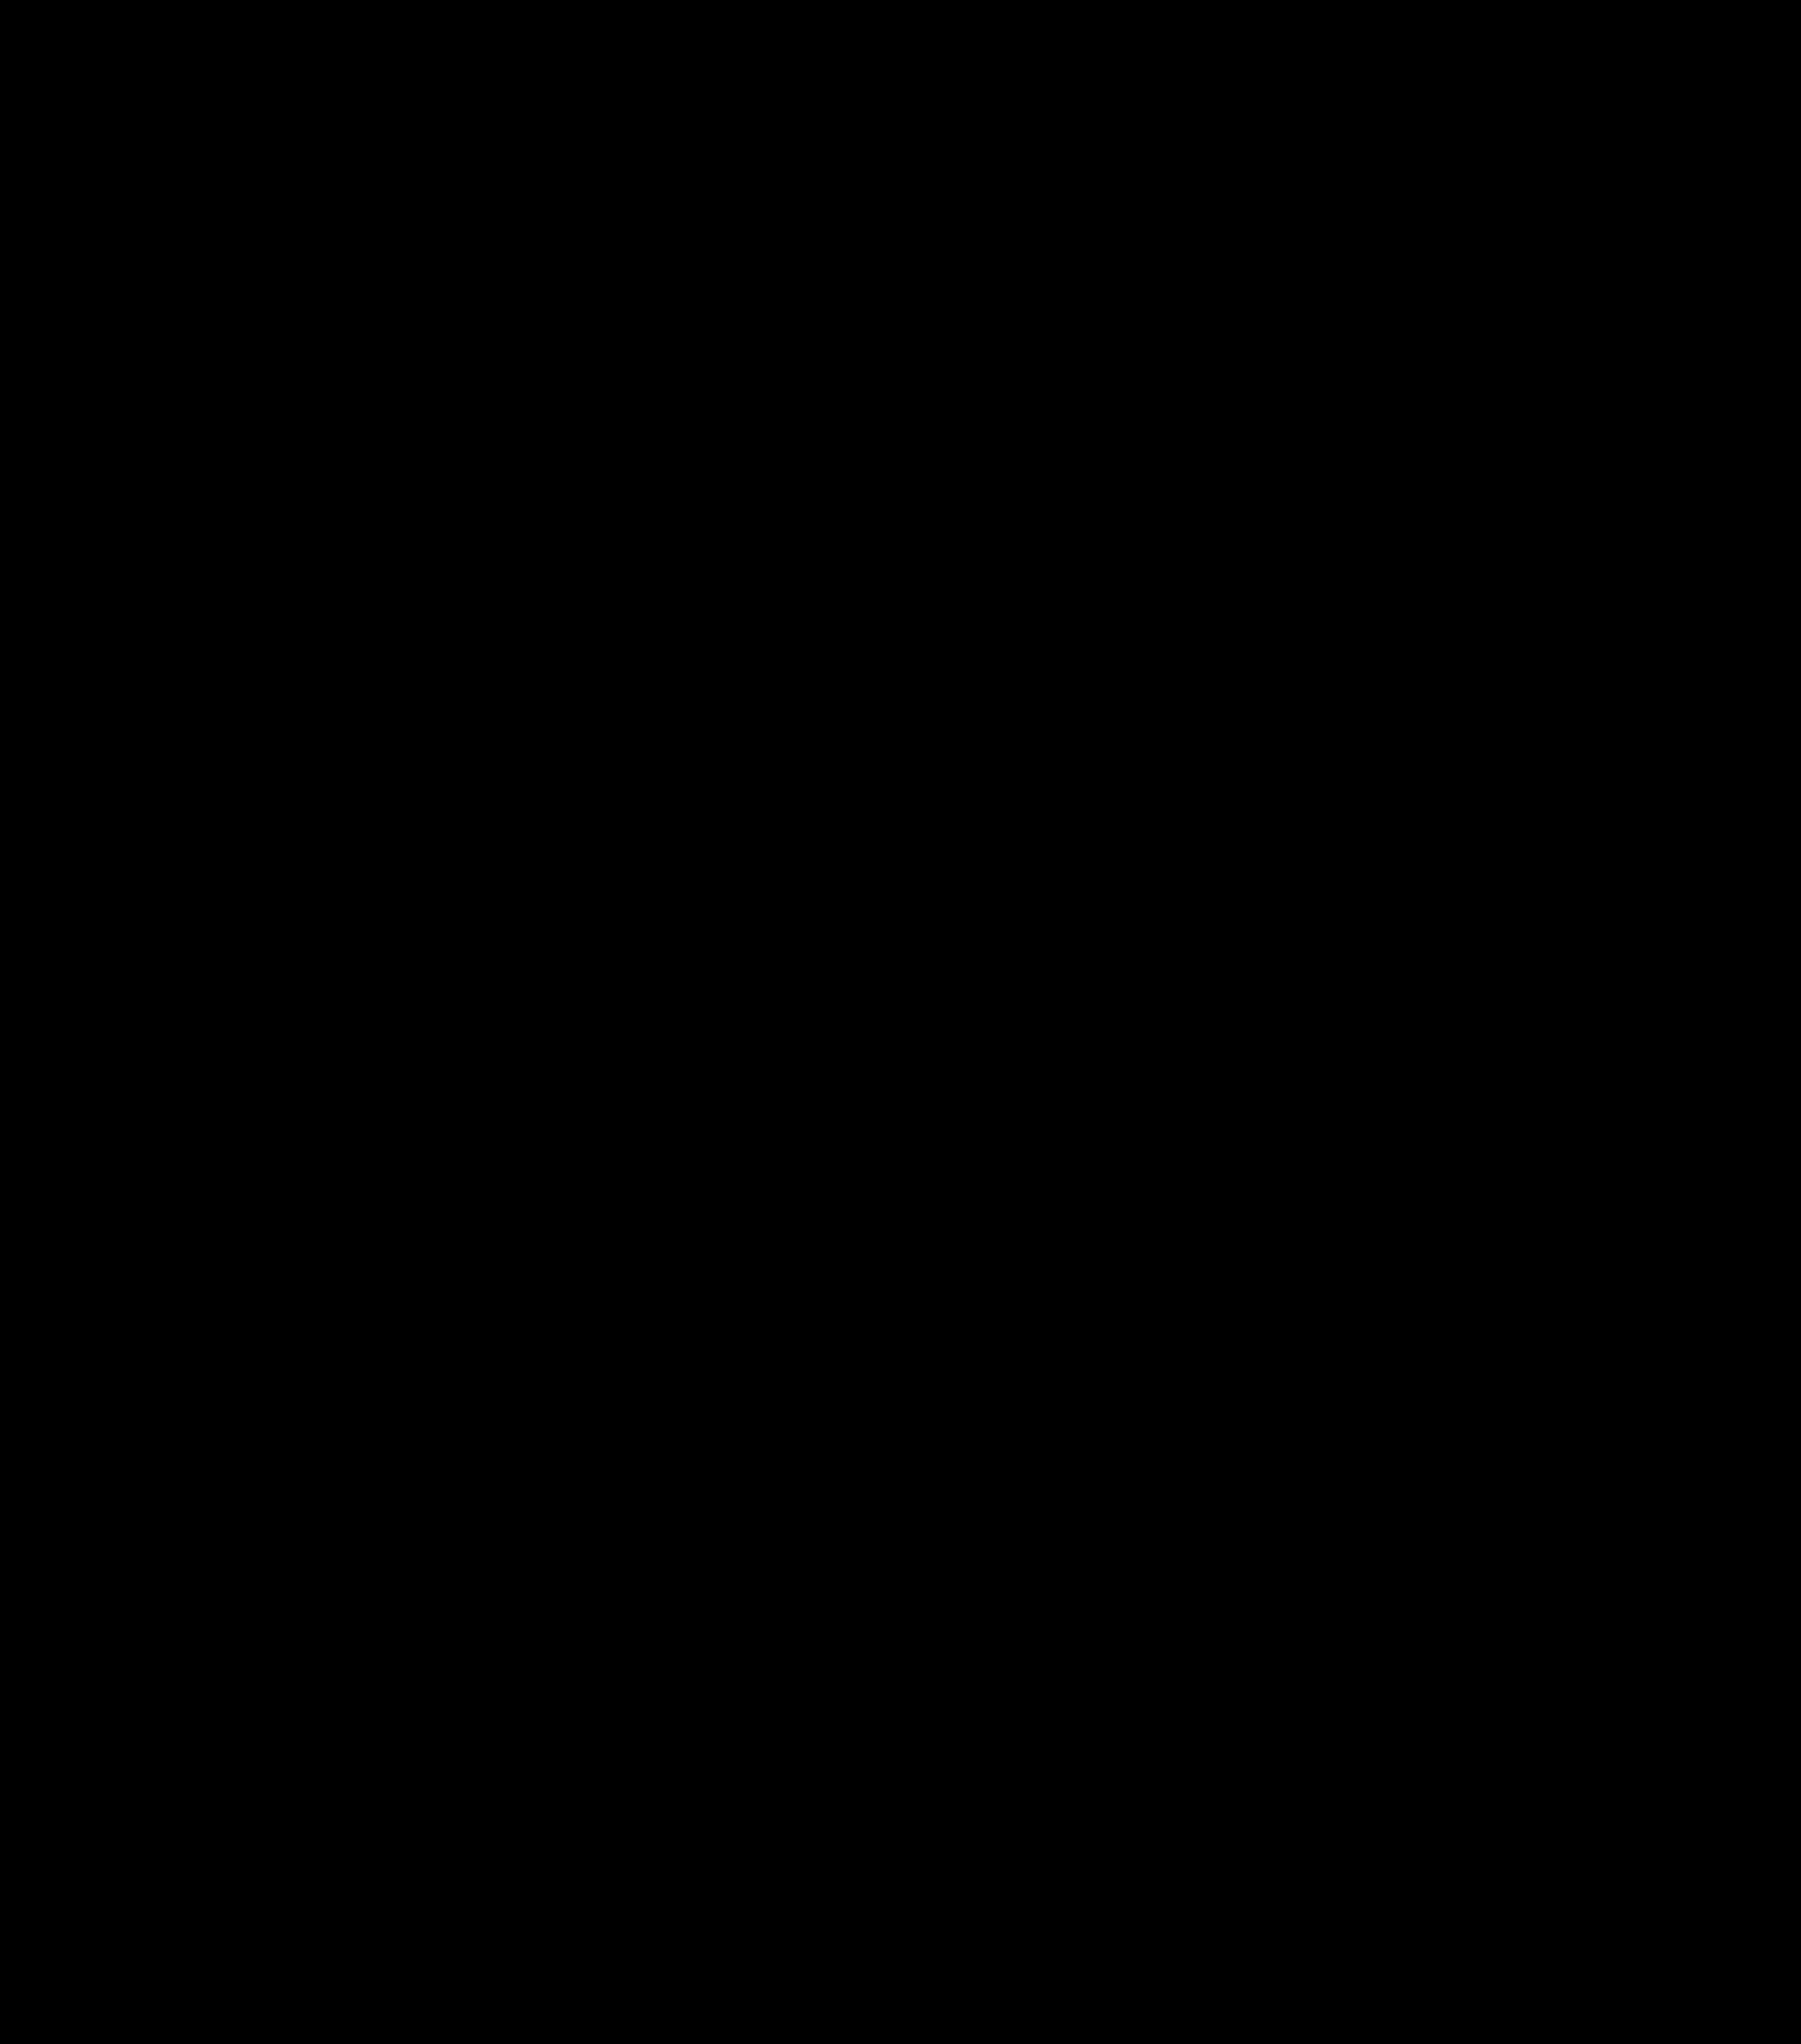 Logo_Misadventures.png